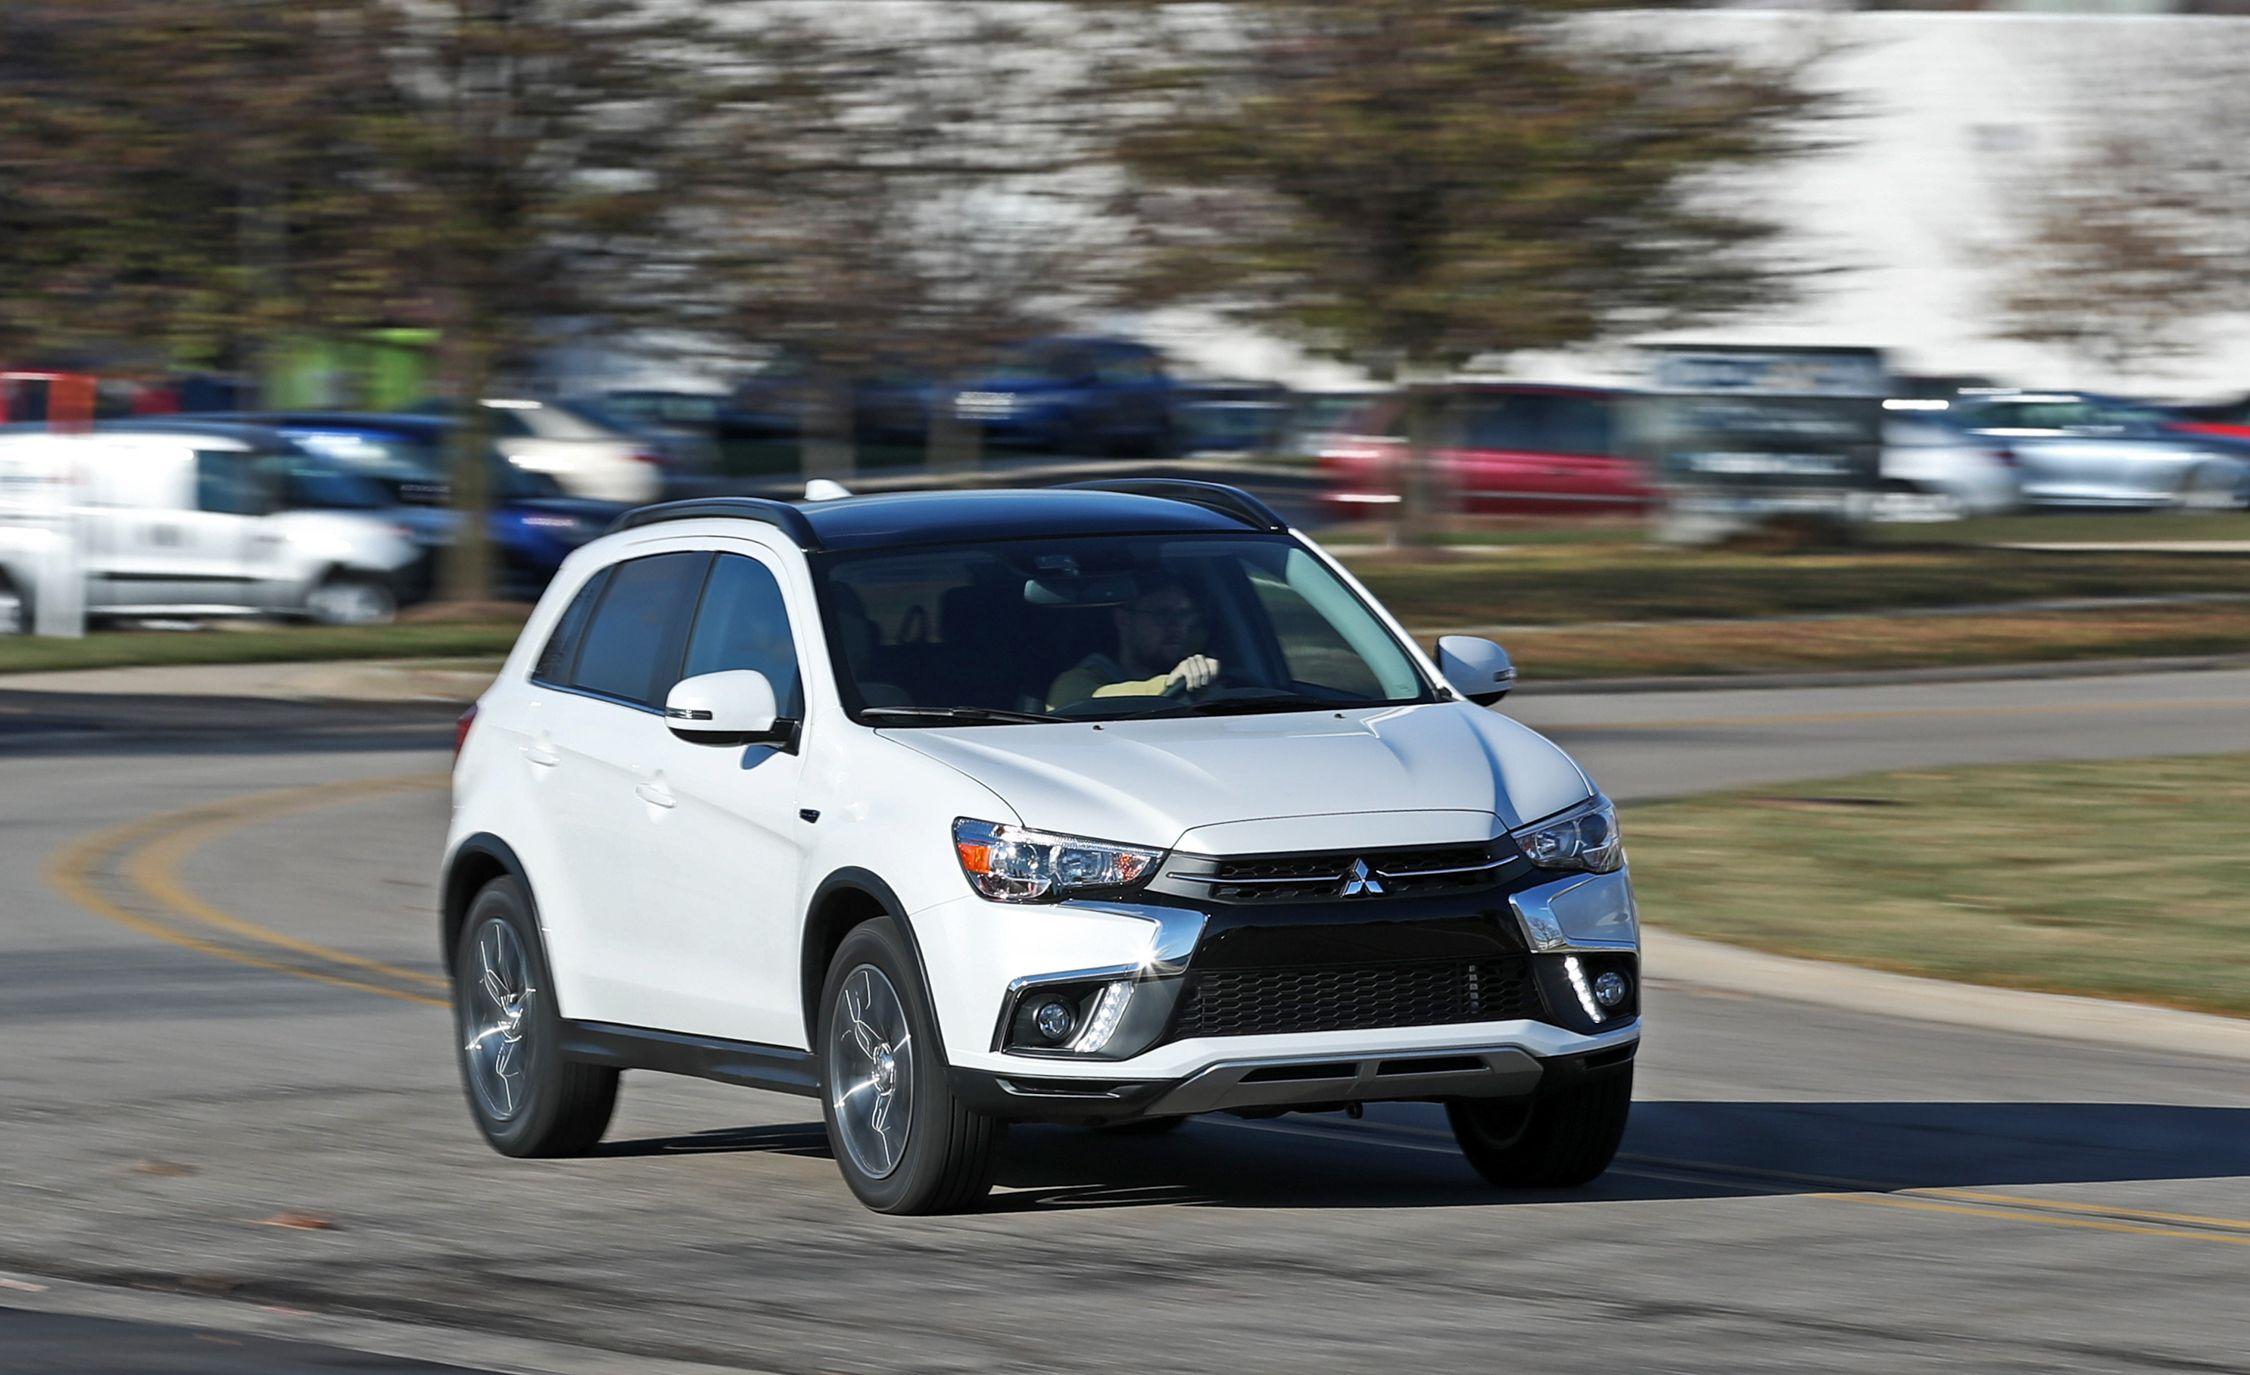 2020 Mitsubishi Outlander Sport Reviews | Mitsubishi Outlander Sport Price, Photos, and Specs | Car and Driver